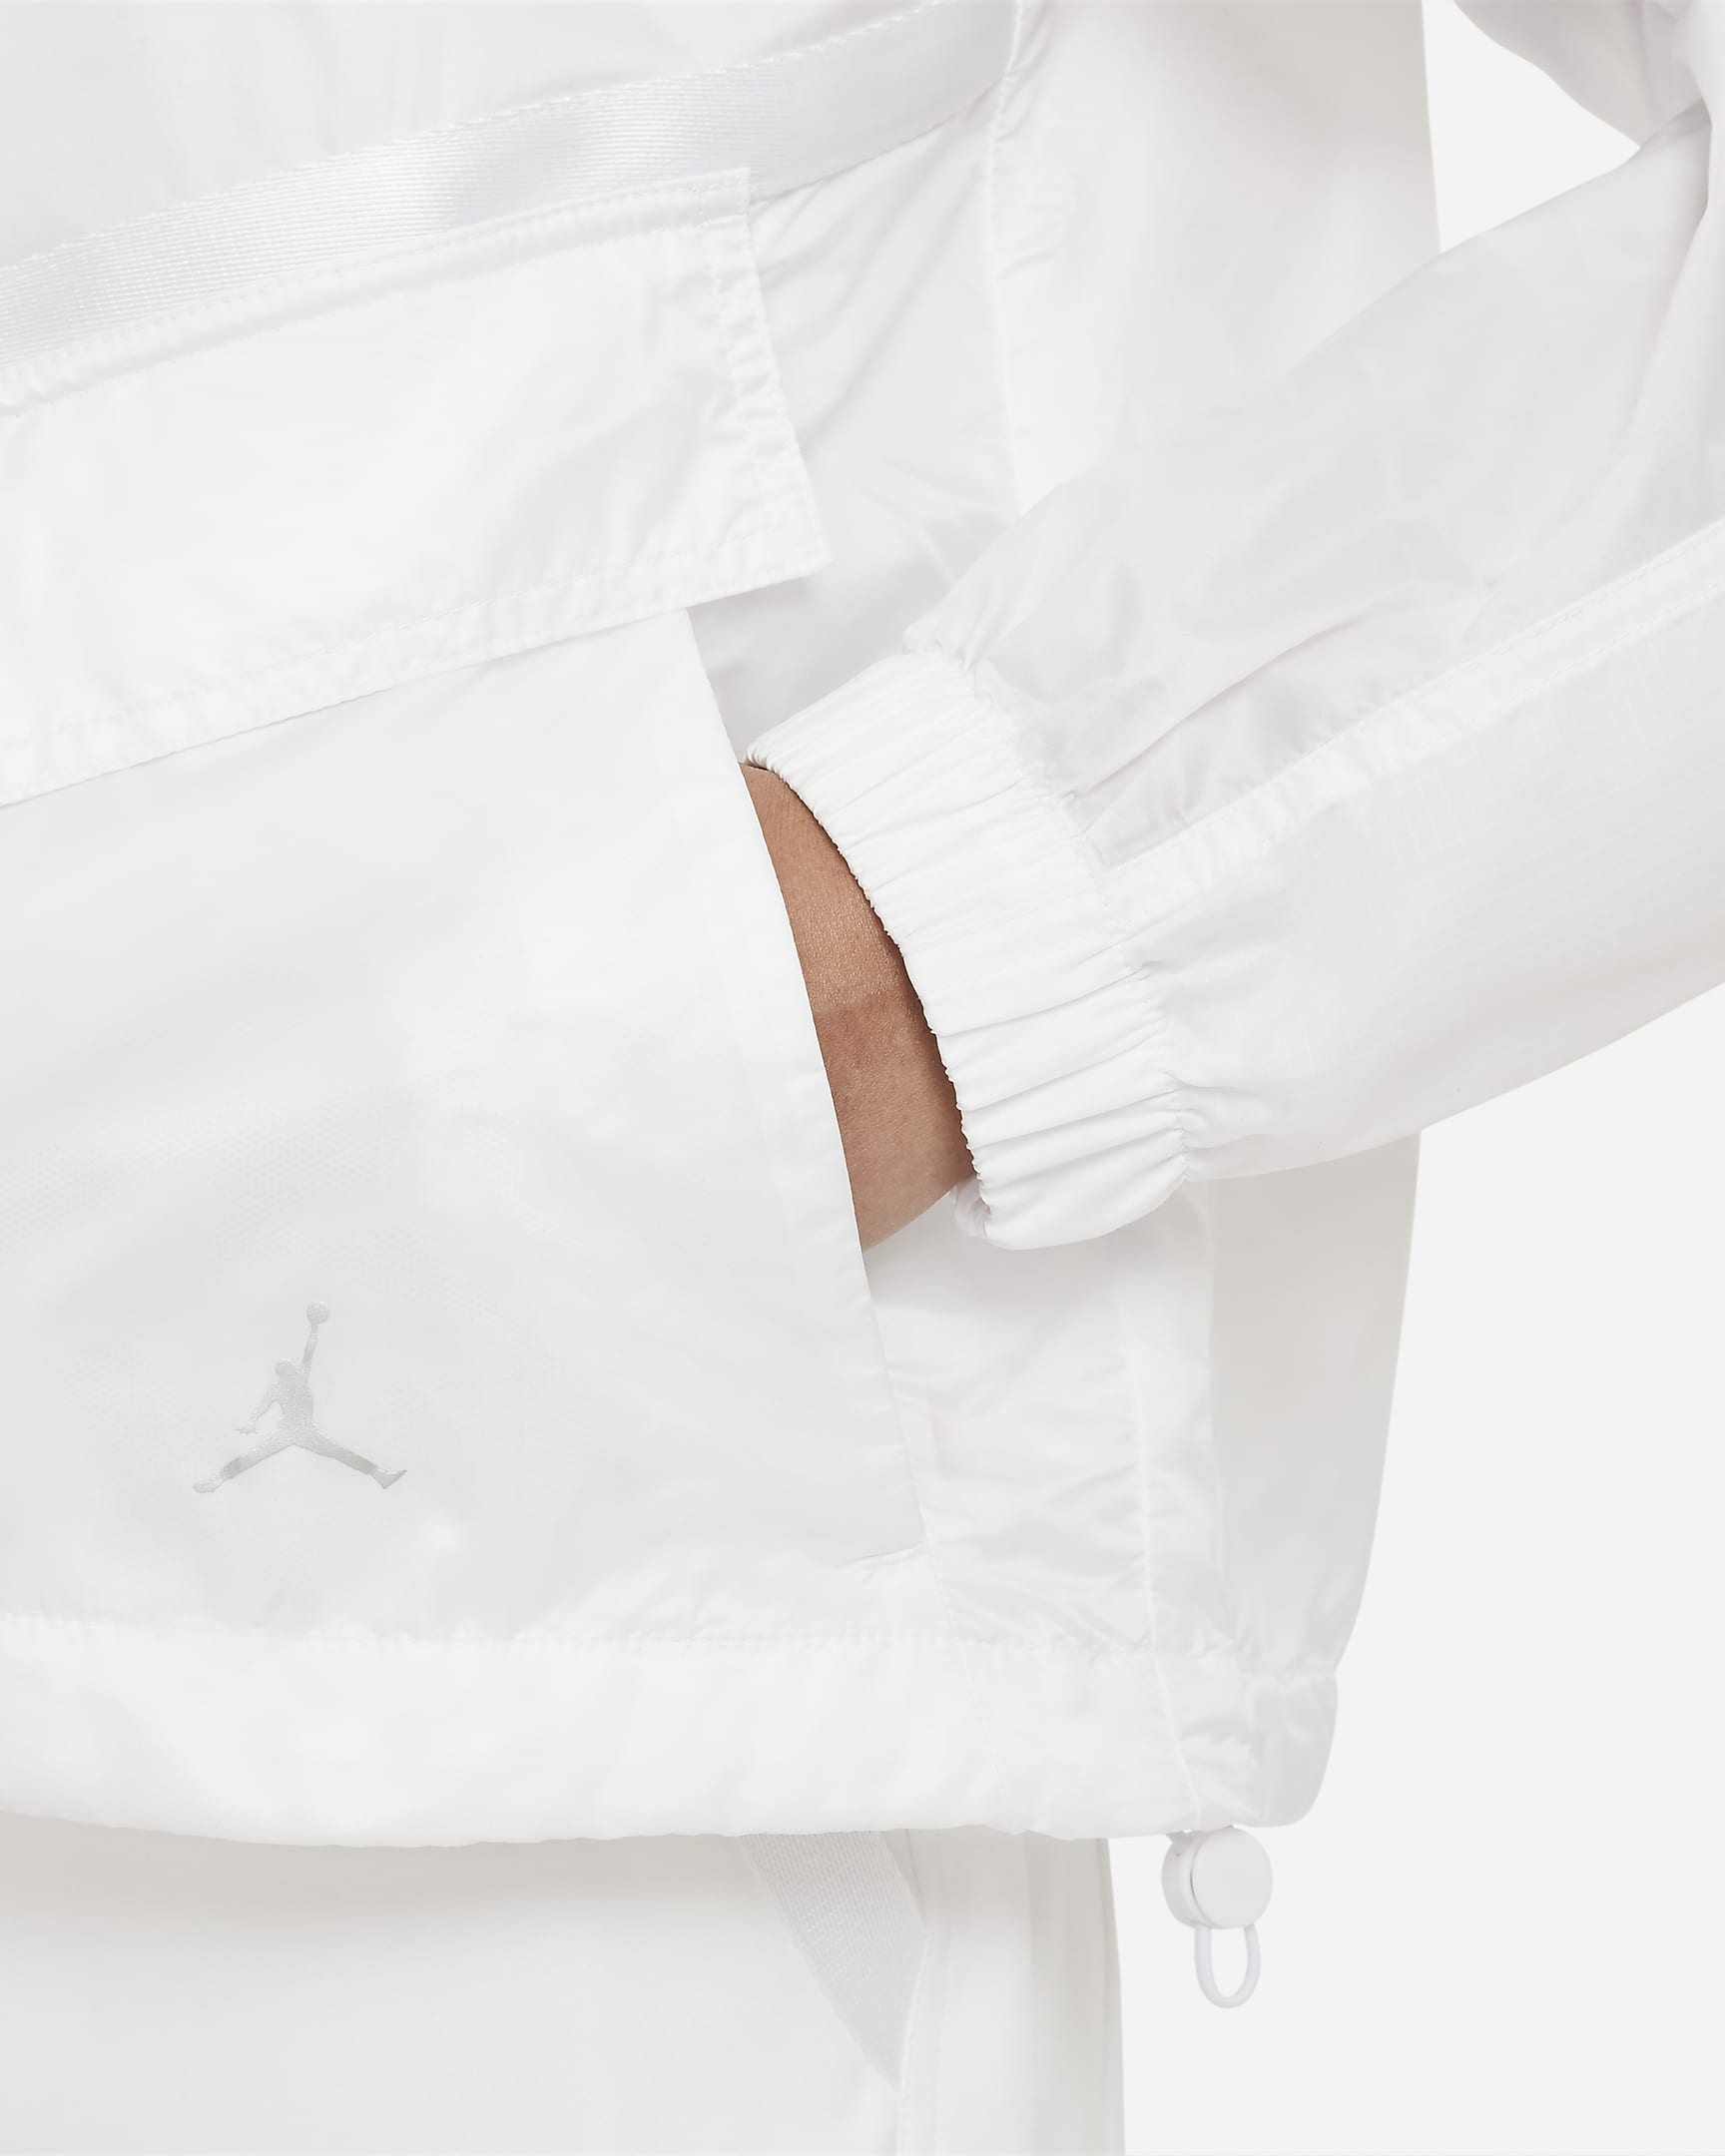 jordan-future-primal-womens-lightweight-jacket-S7Cnt0-3.png